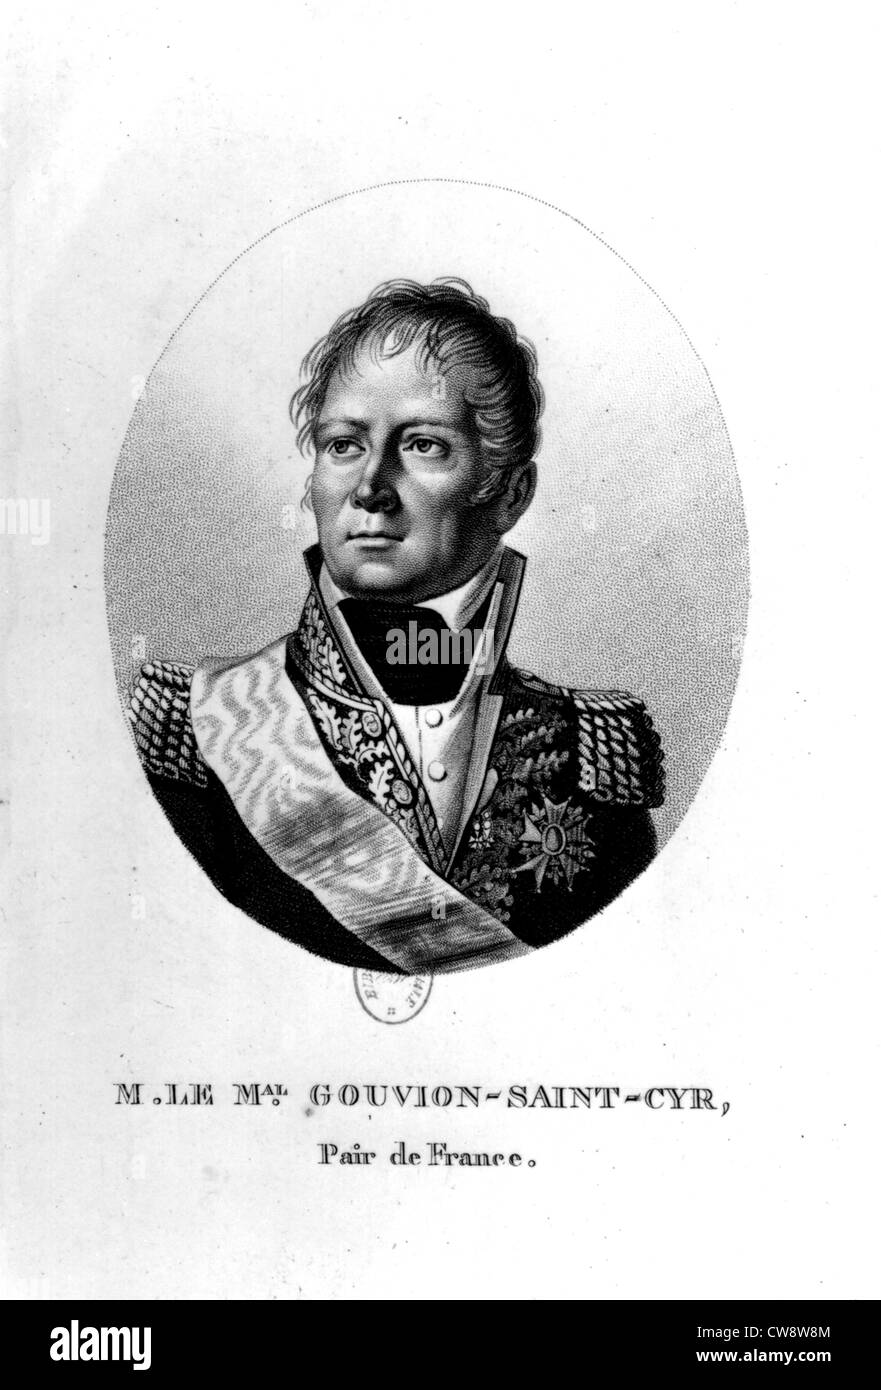 Marshal Gouvion Saint-Cyr - Stock Image